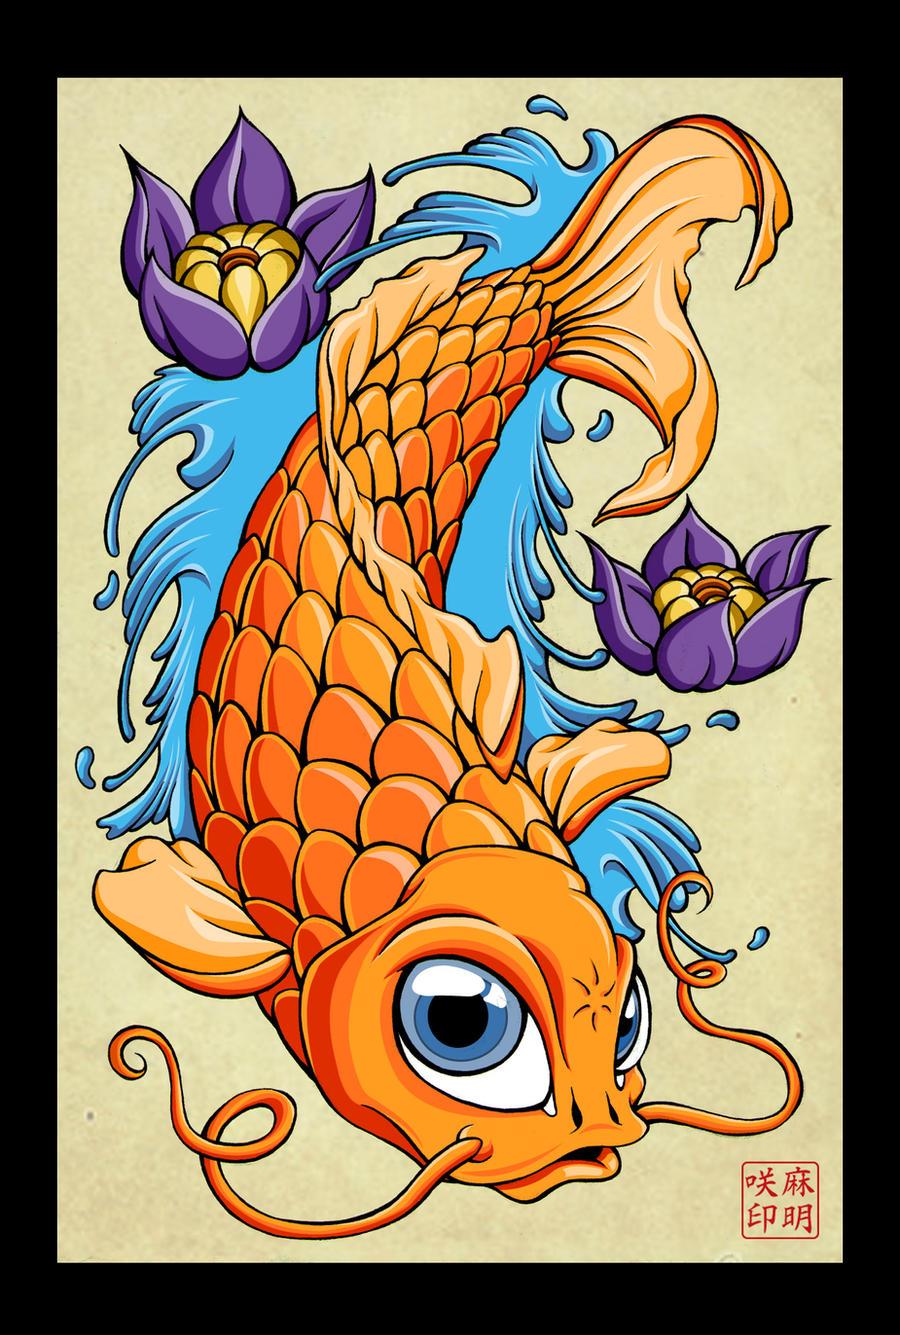 Pez koi significado plantillas tatuajes pictures car for Significado de pez koi